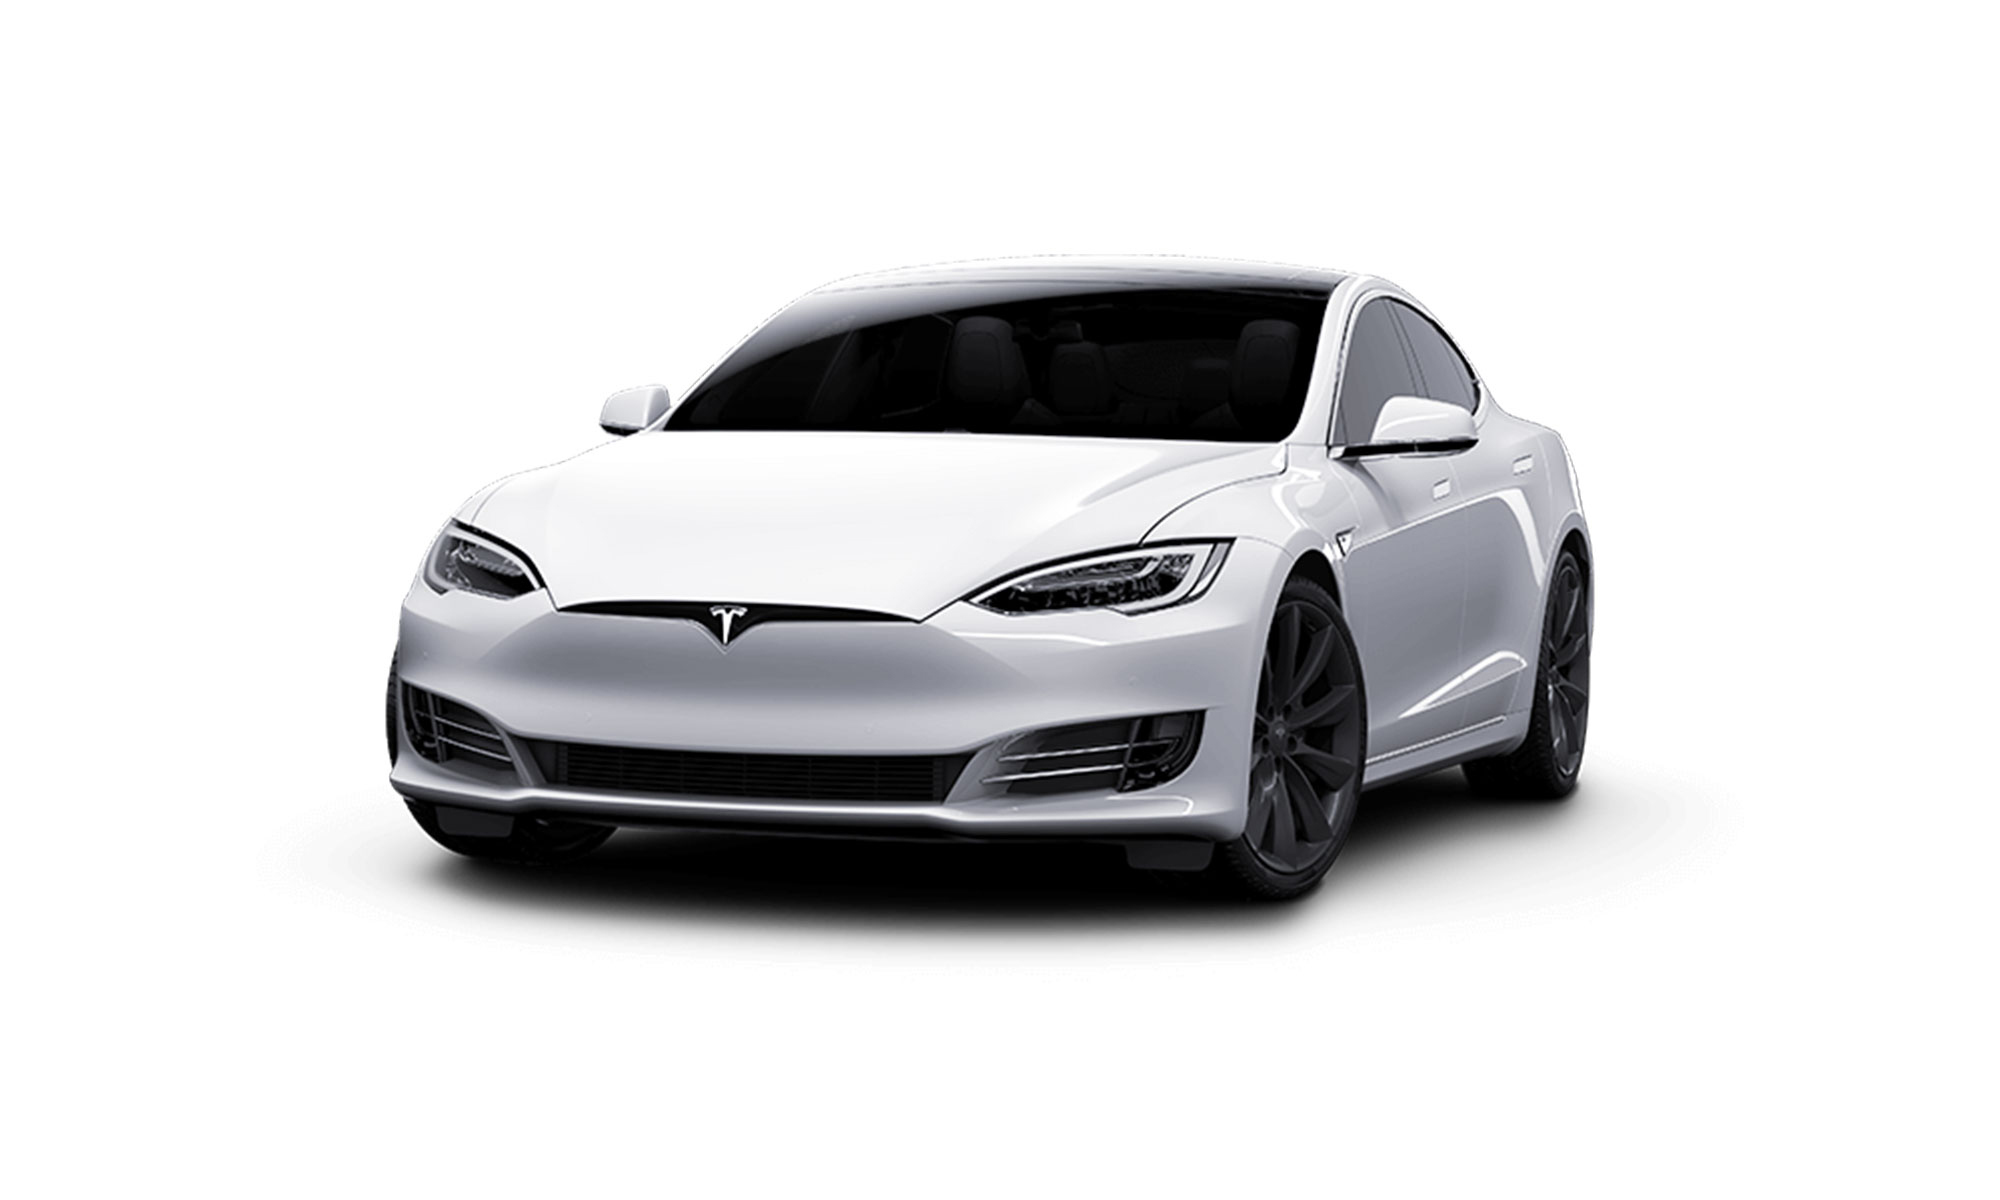 Tesla Model S Ludicrous Performance (2019)